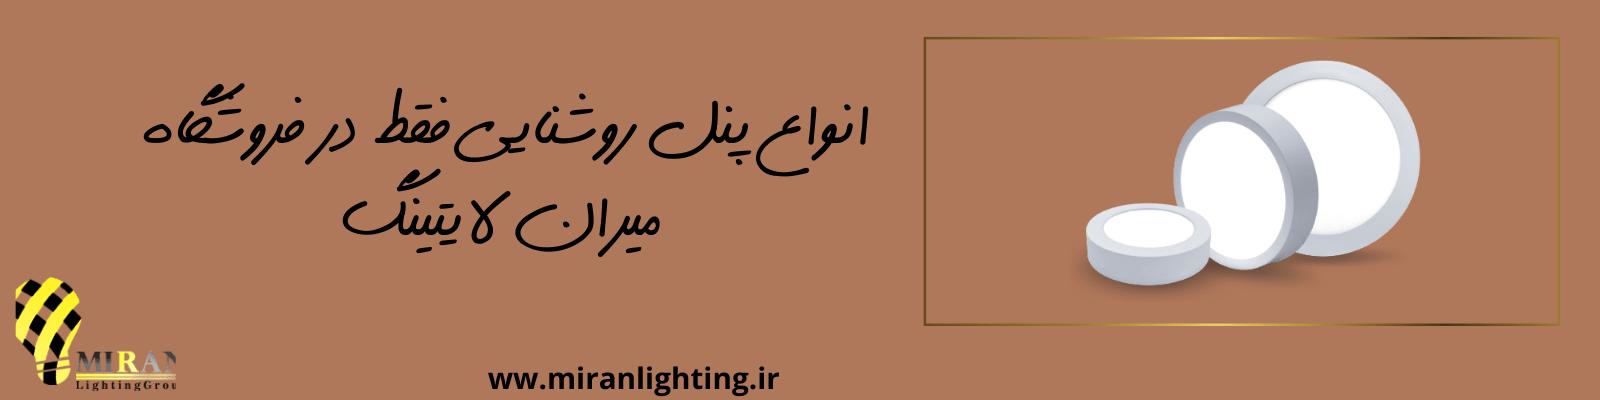 پنل روشنایی میران لایتینگ